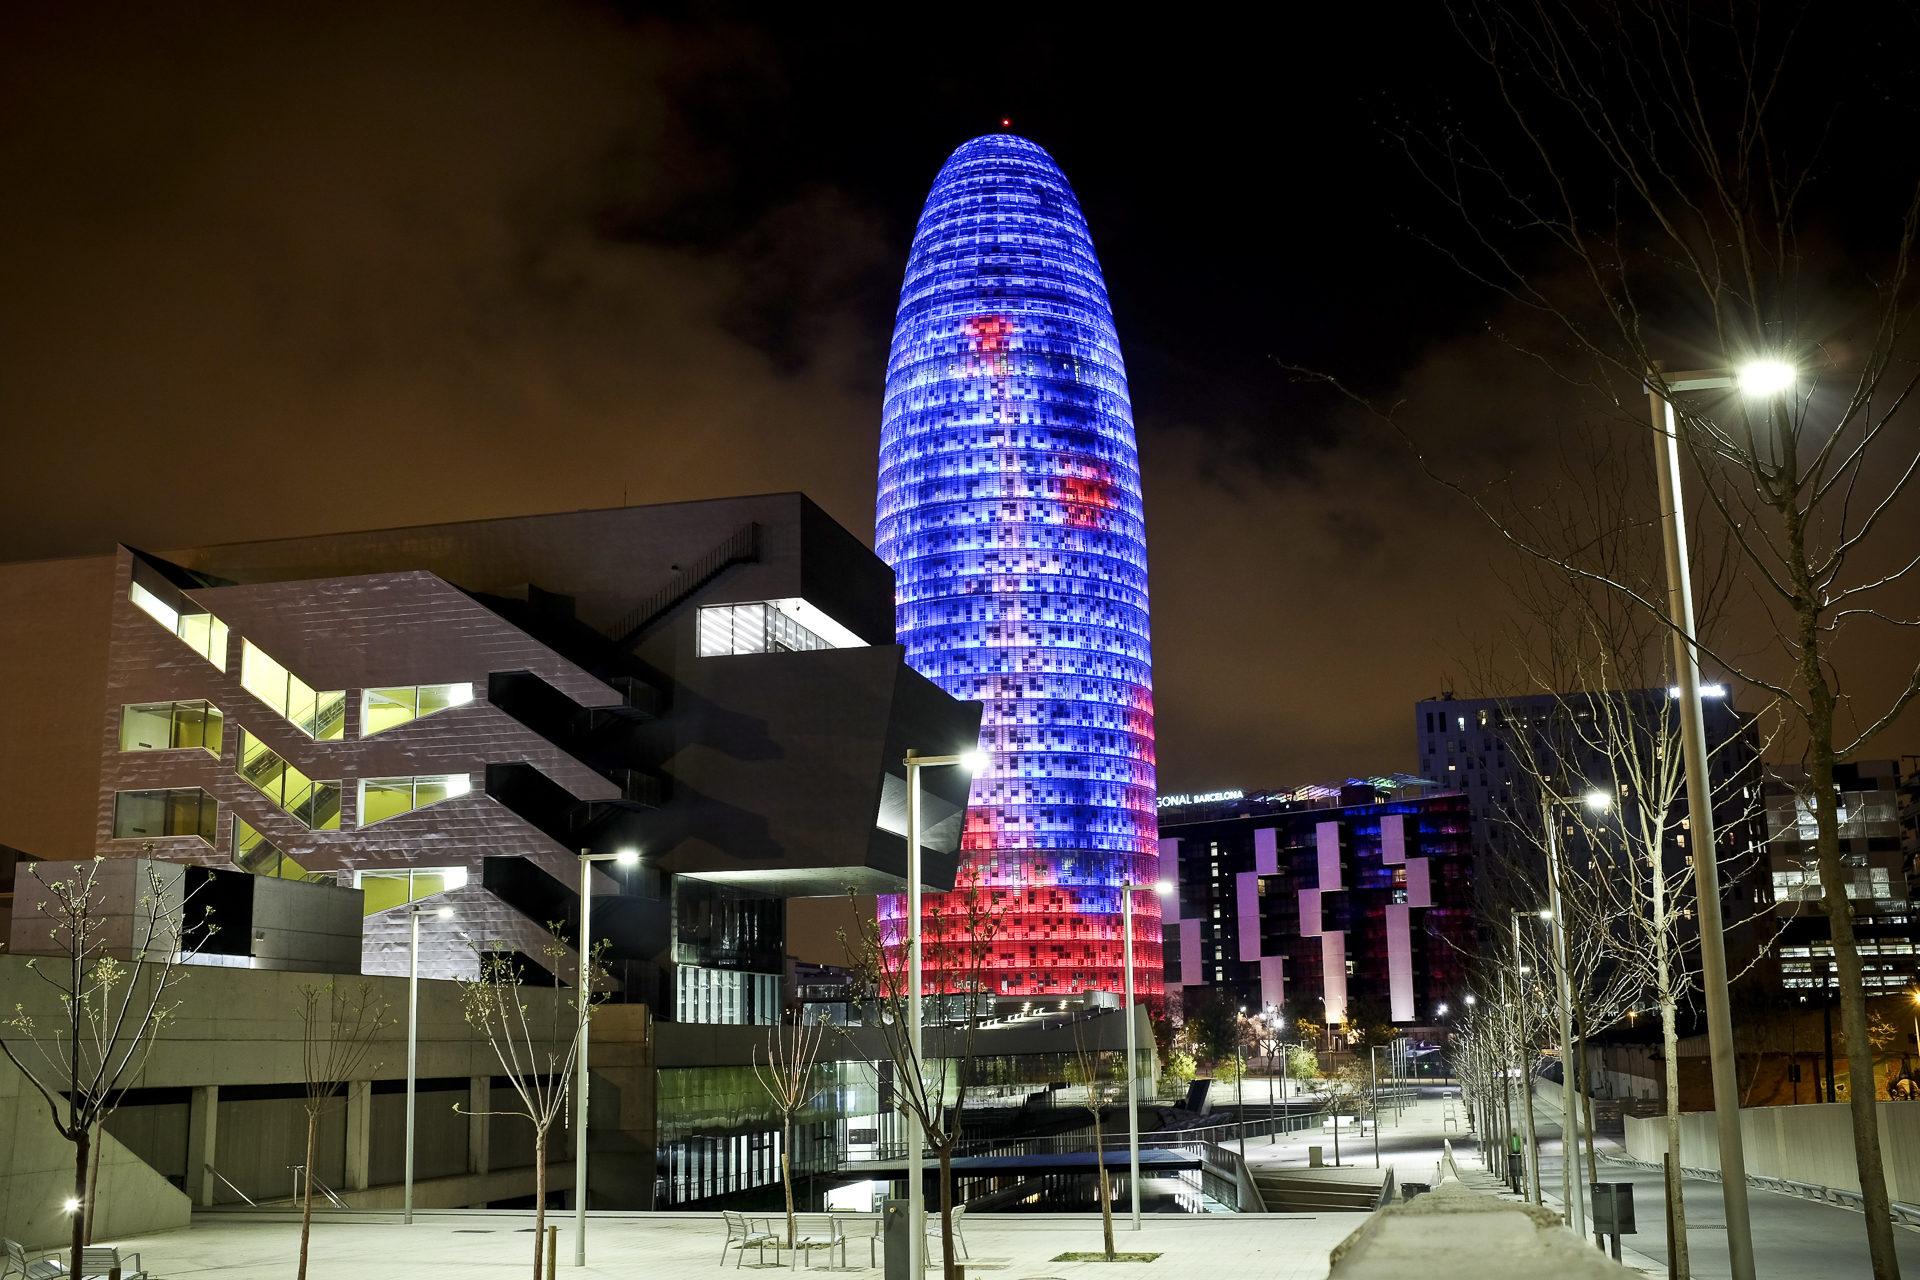 barcelona_18_03_copyright_thomas_schmidt_033